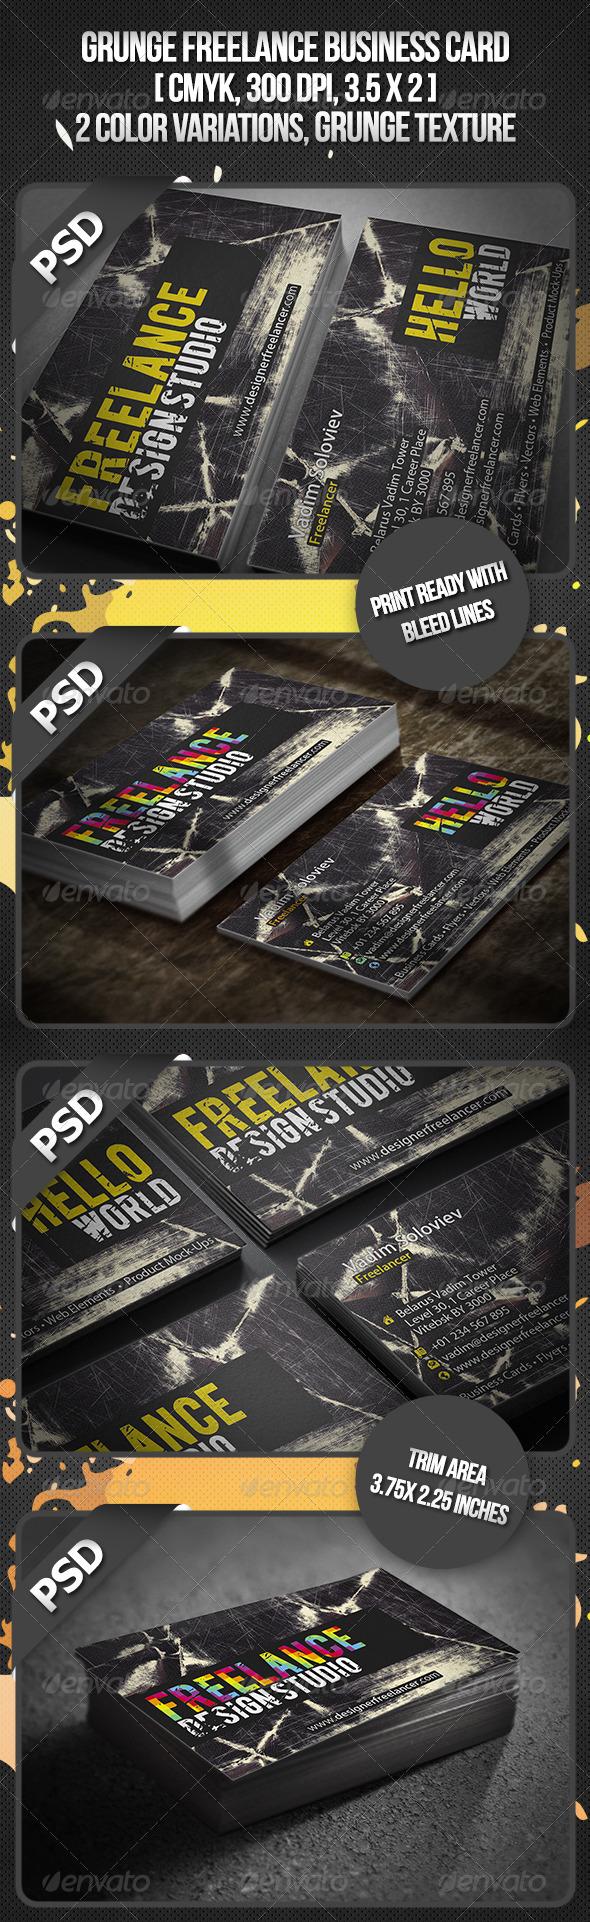 GraphicRiver Grunge Freelance Business Card 3473202